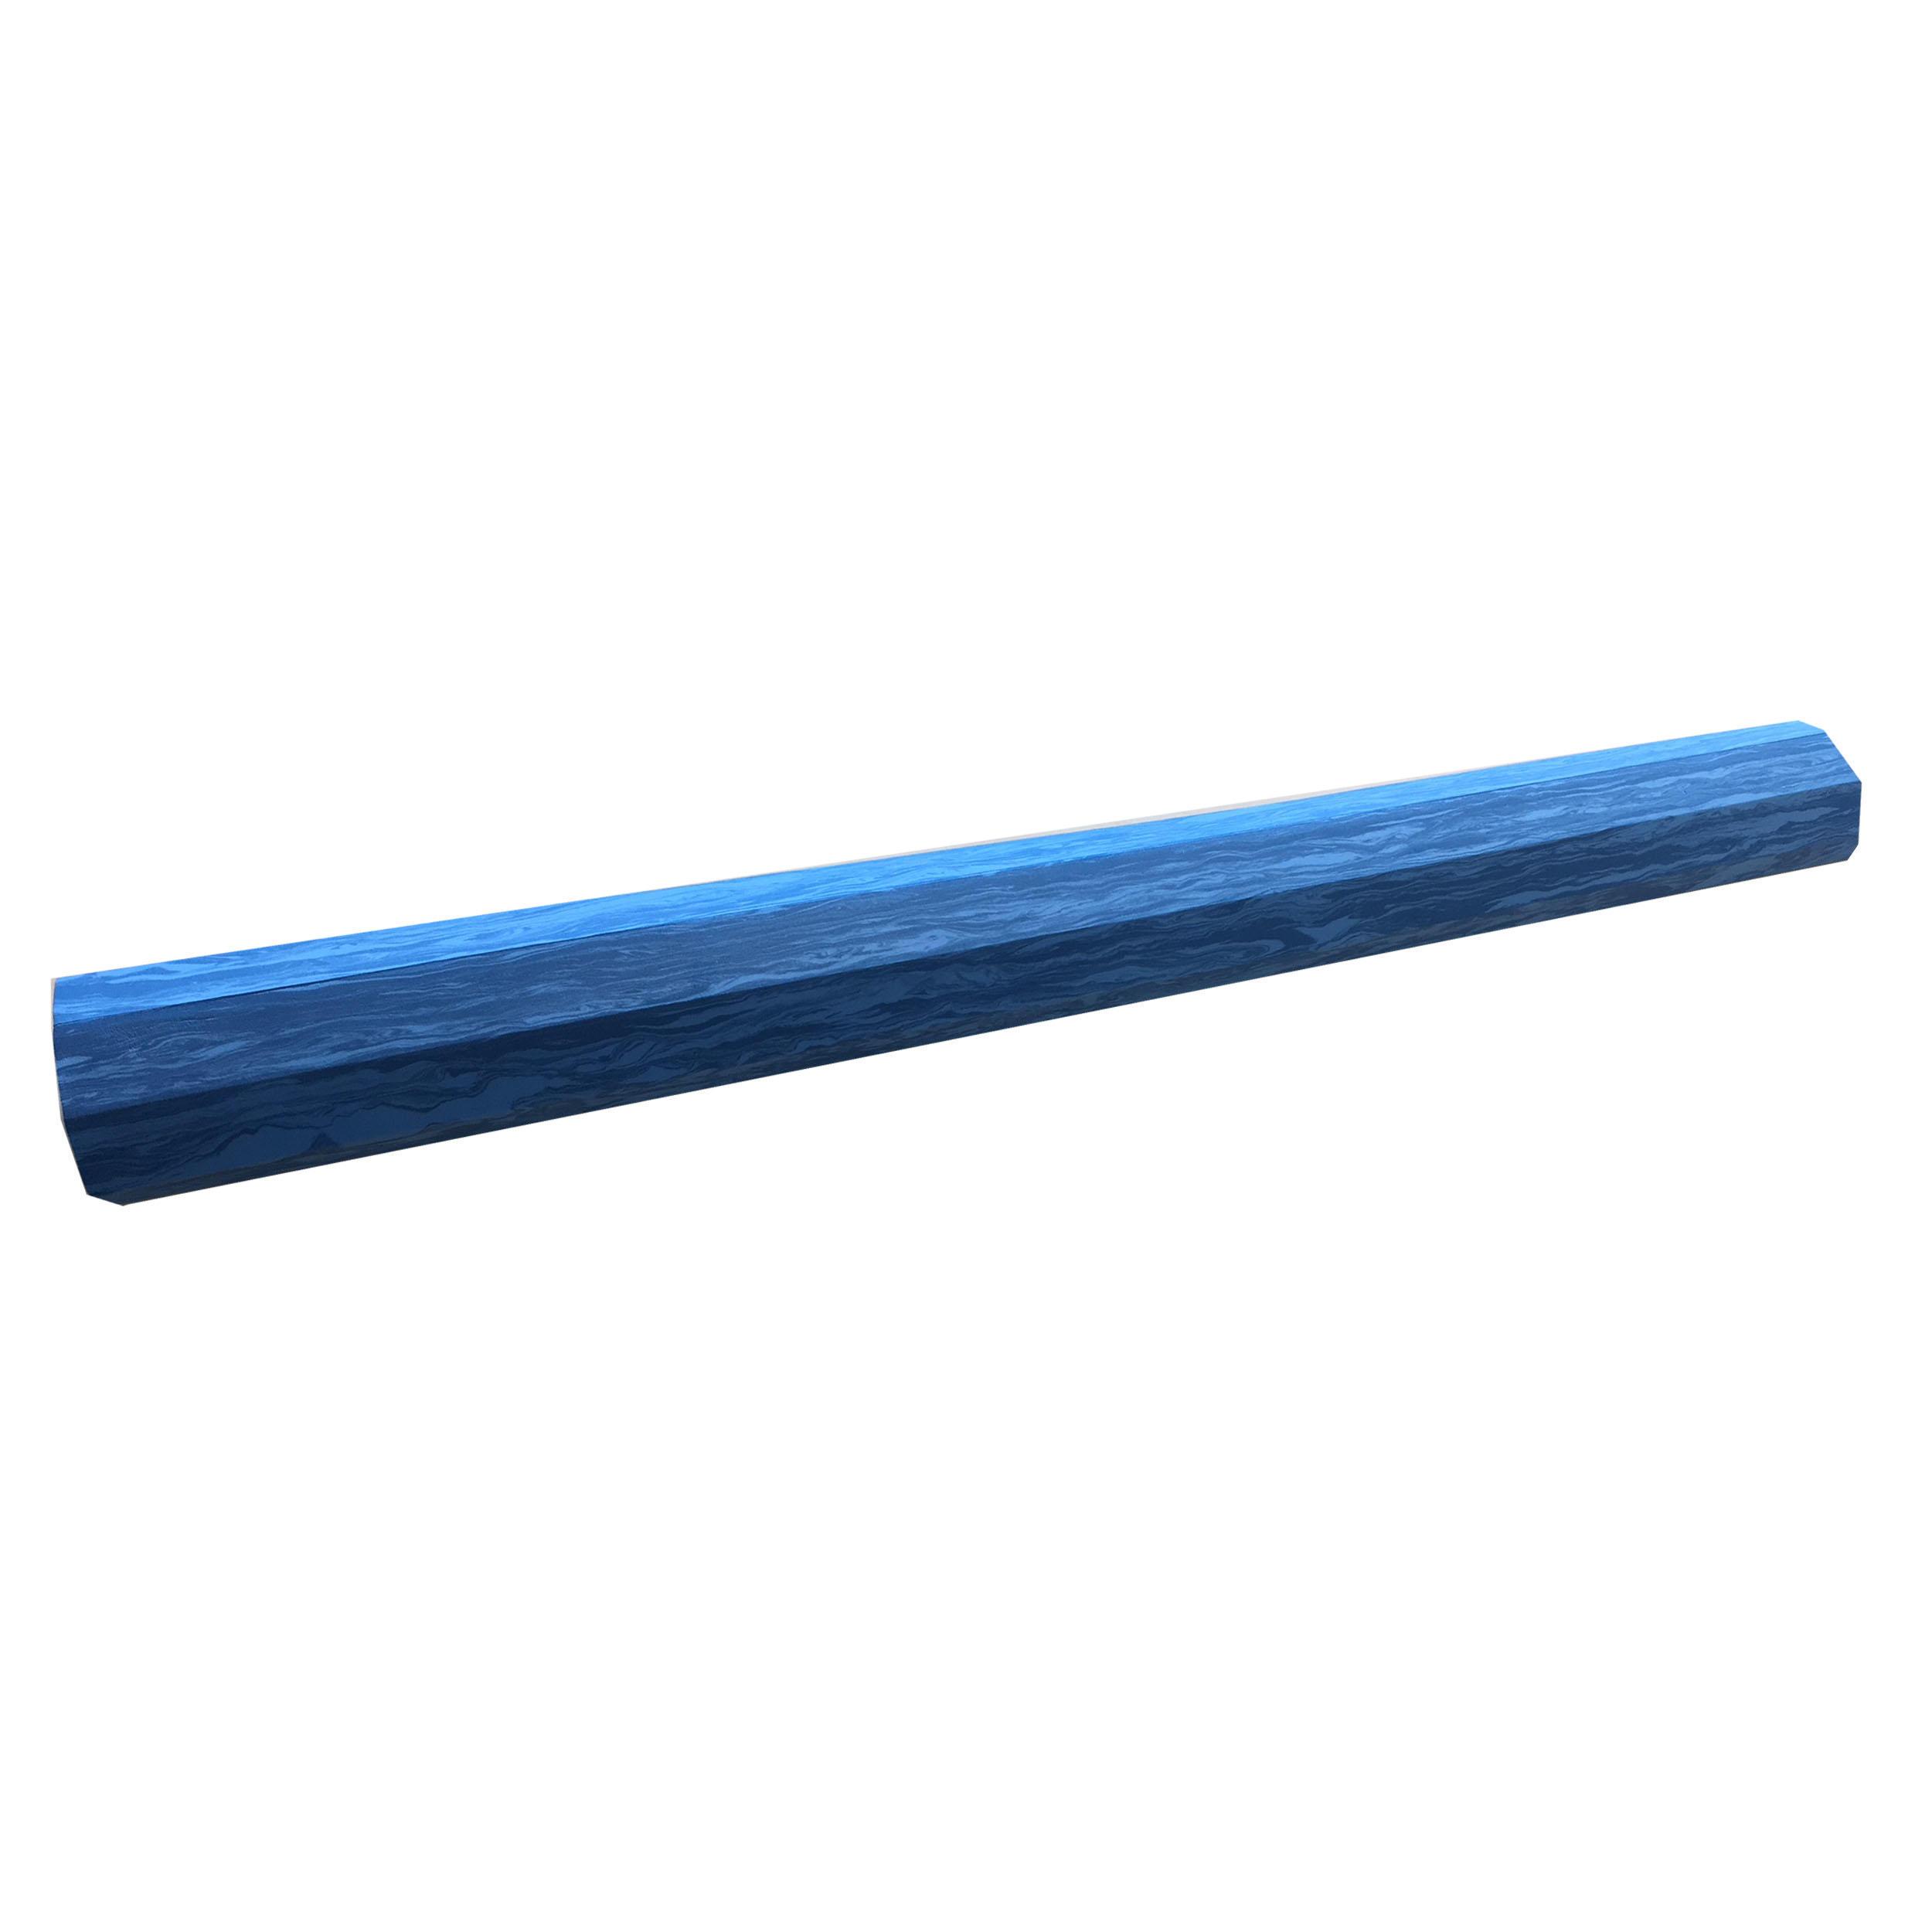 Baghetă Aquagym Albastru